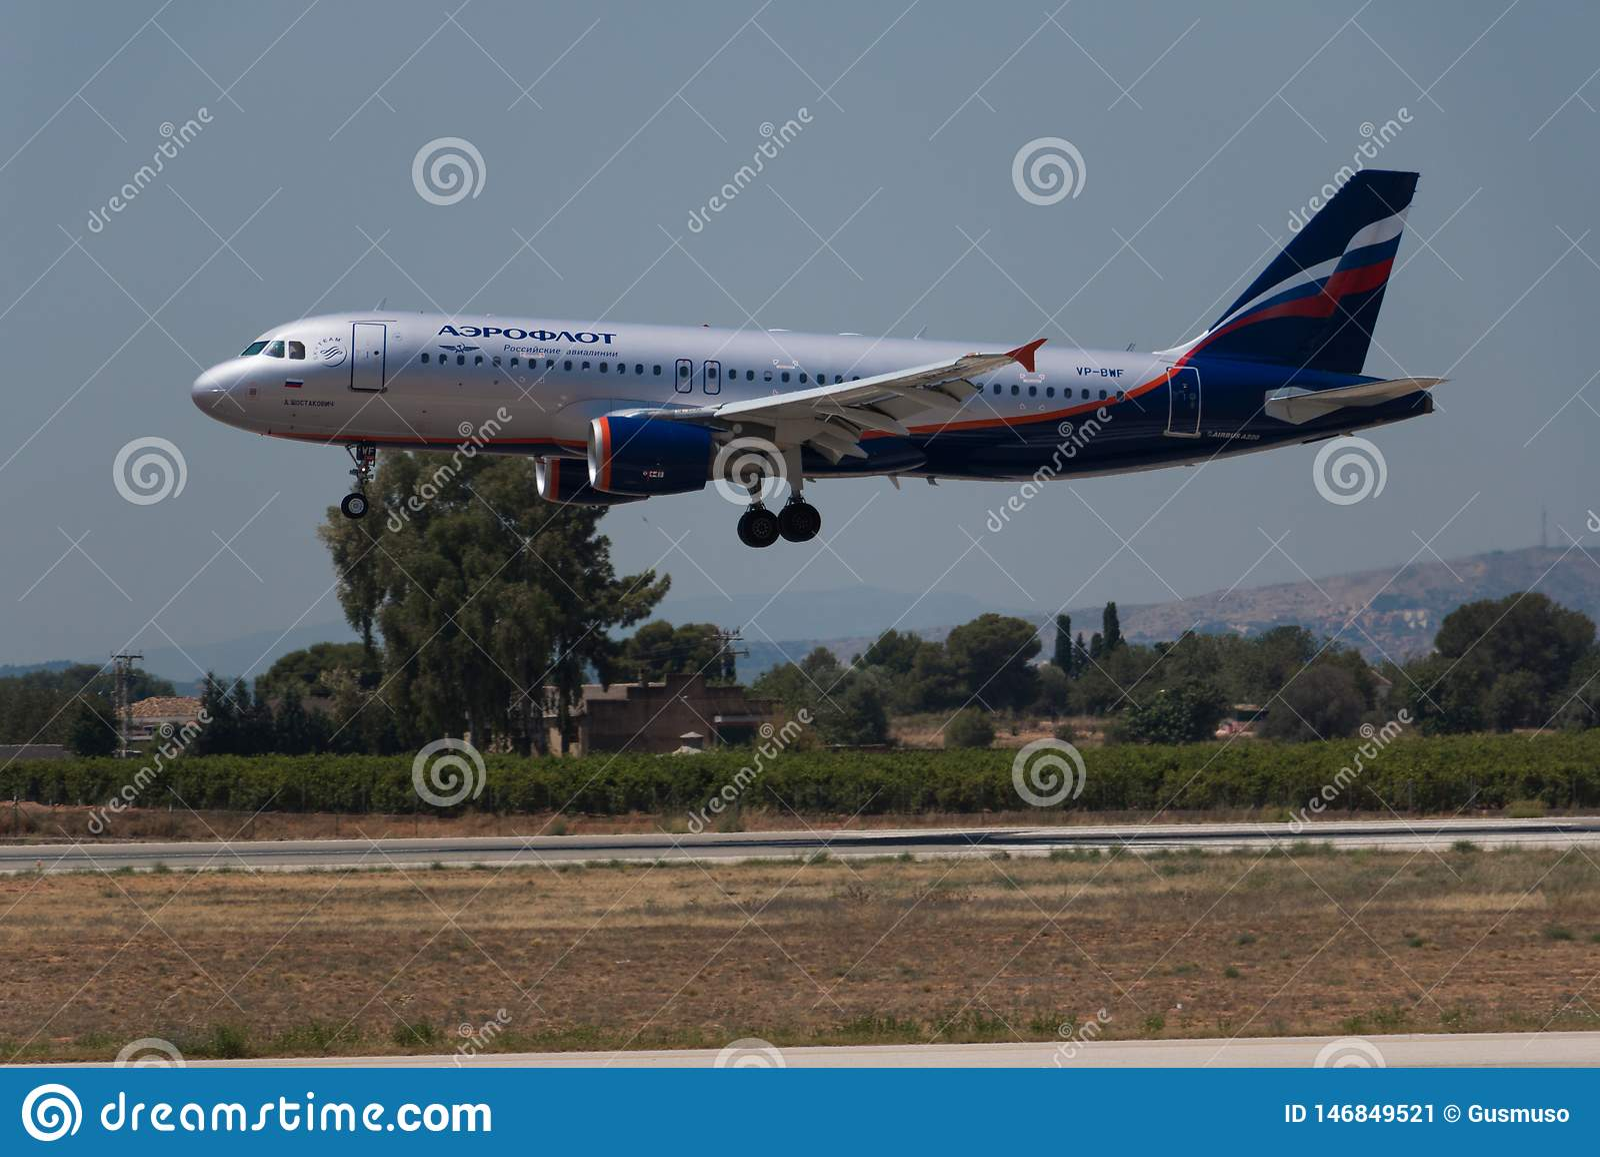 Manises, Spain - June 16, 2016: Aeroflot Airbus A320 landing at Manises airport in Valencia, Spain